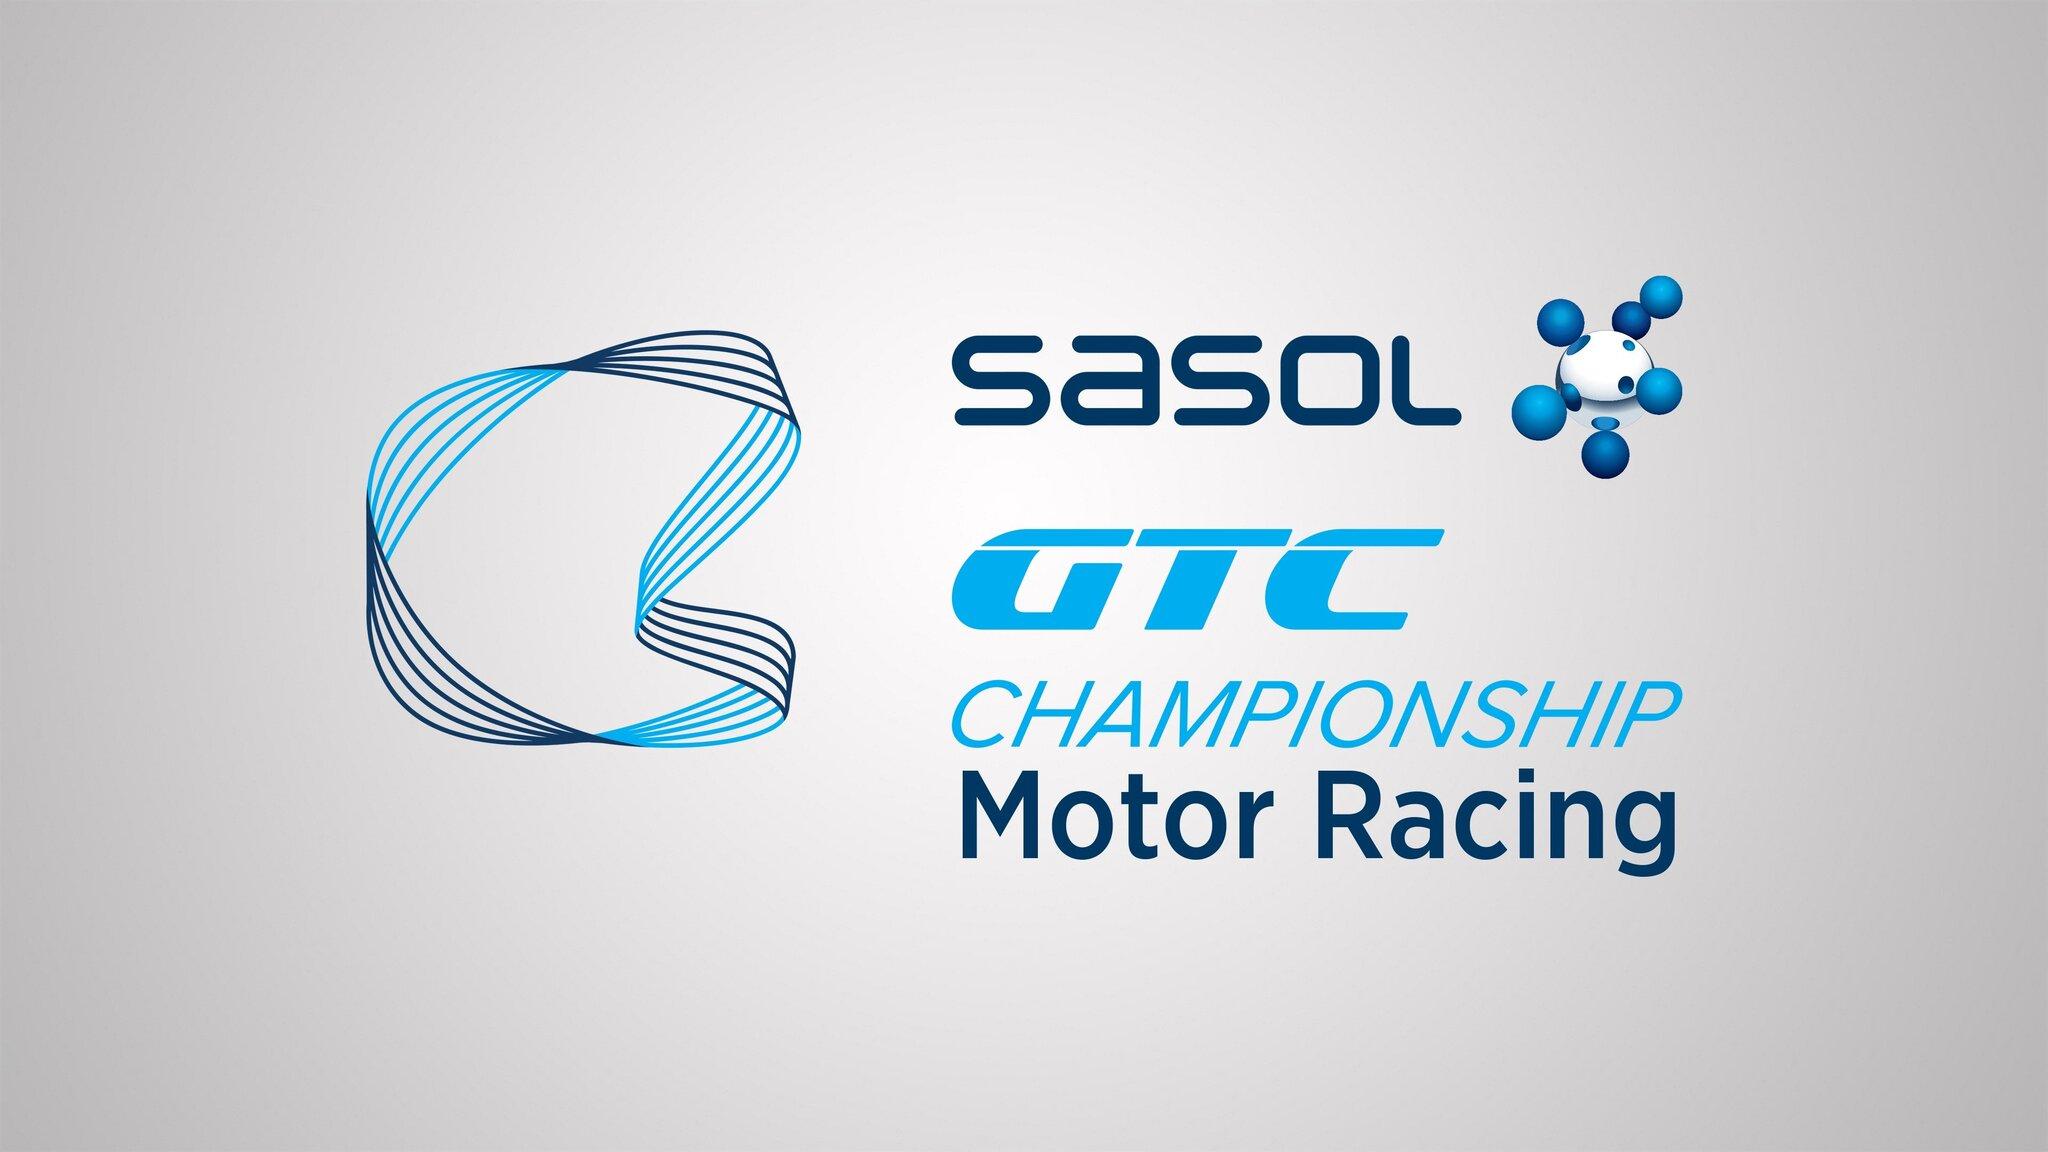 South African GTC Championship Motor Racing